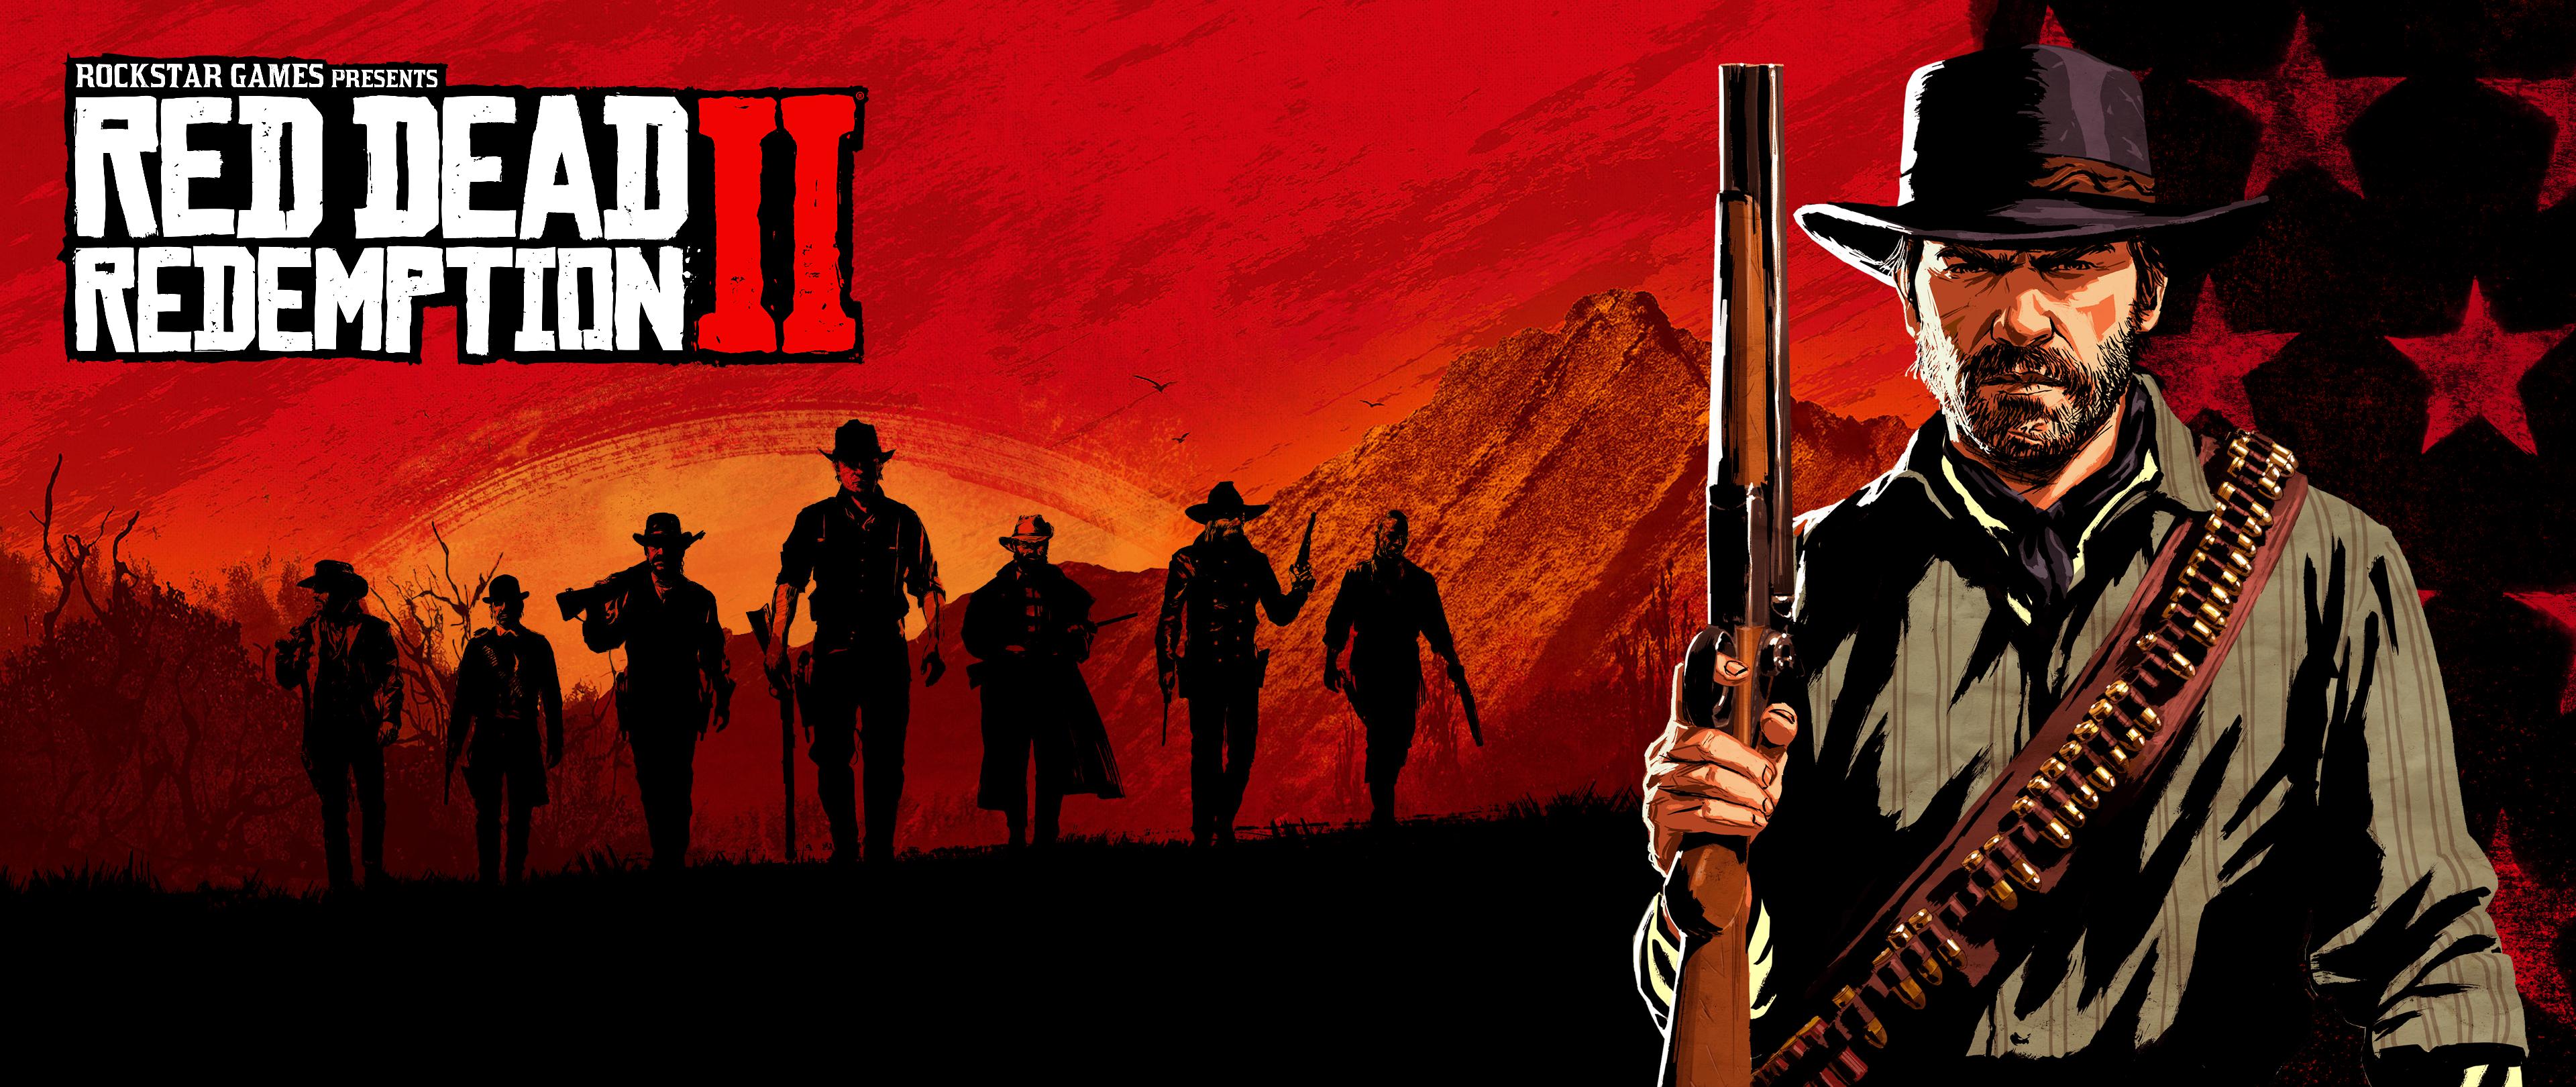 Steam Community Red Dead Redemption 2 Wallpaper